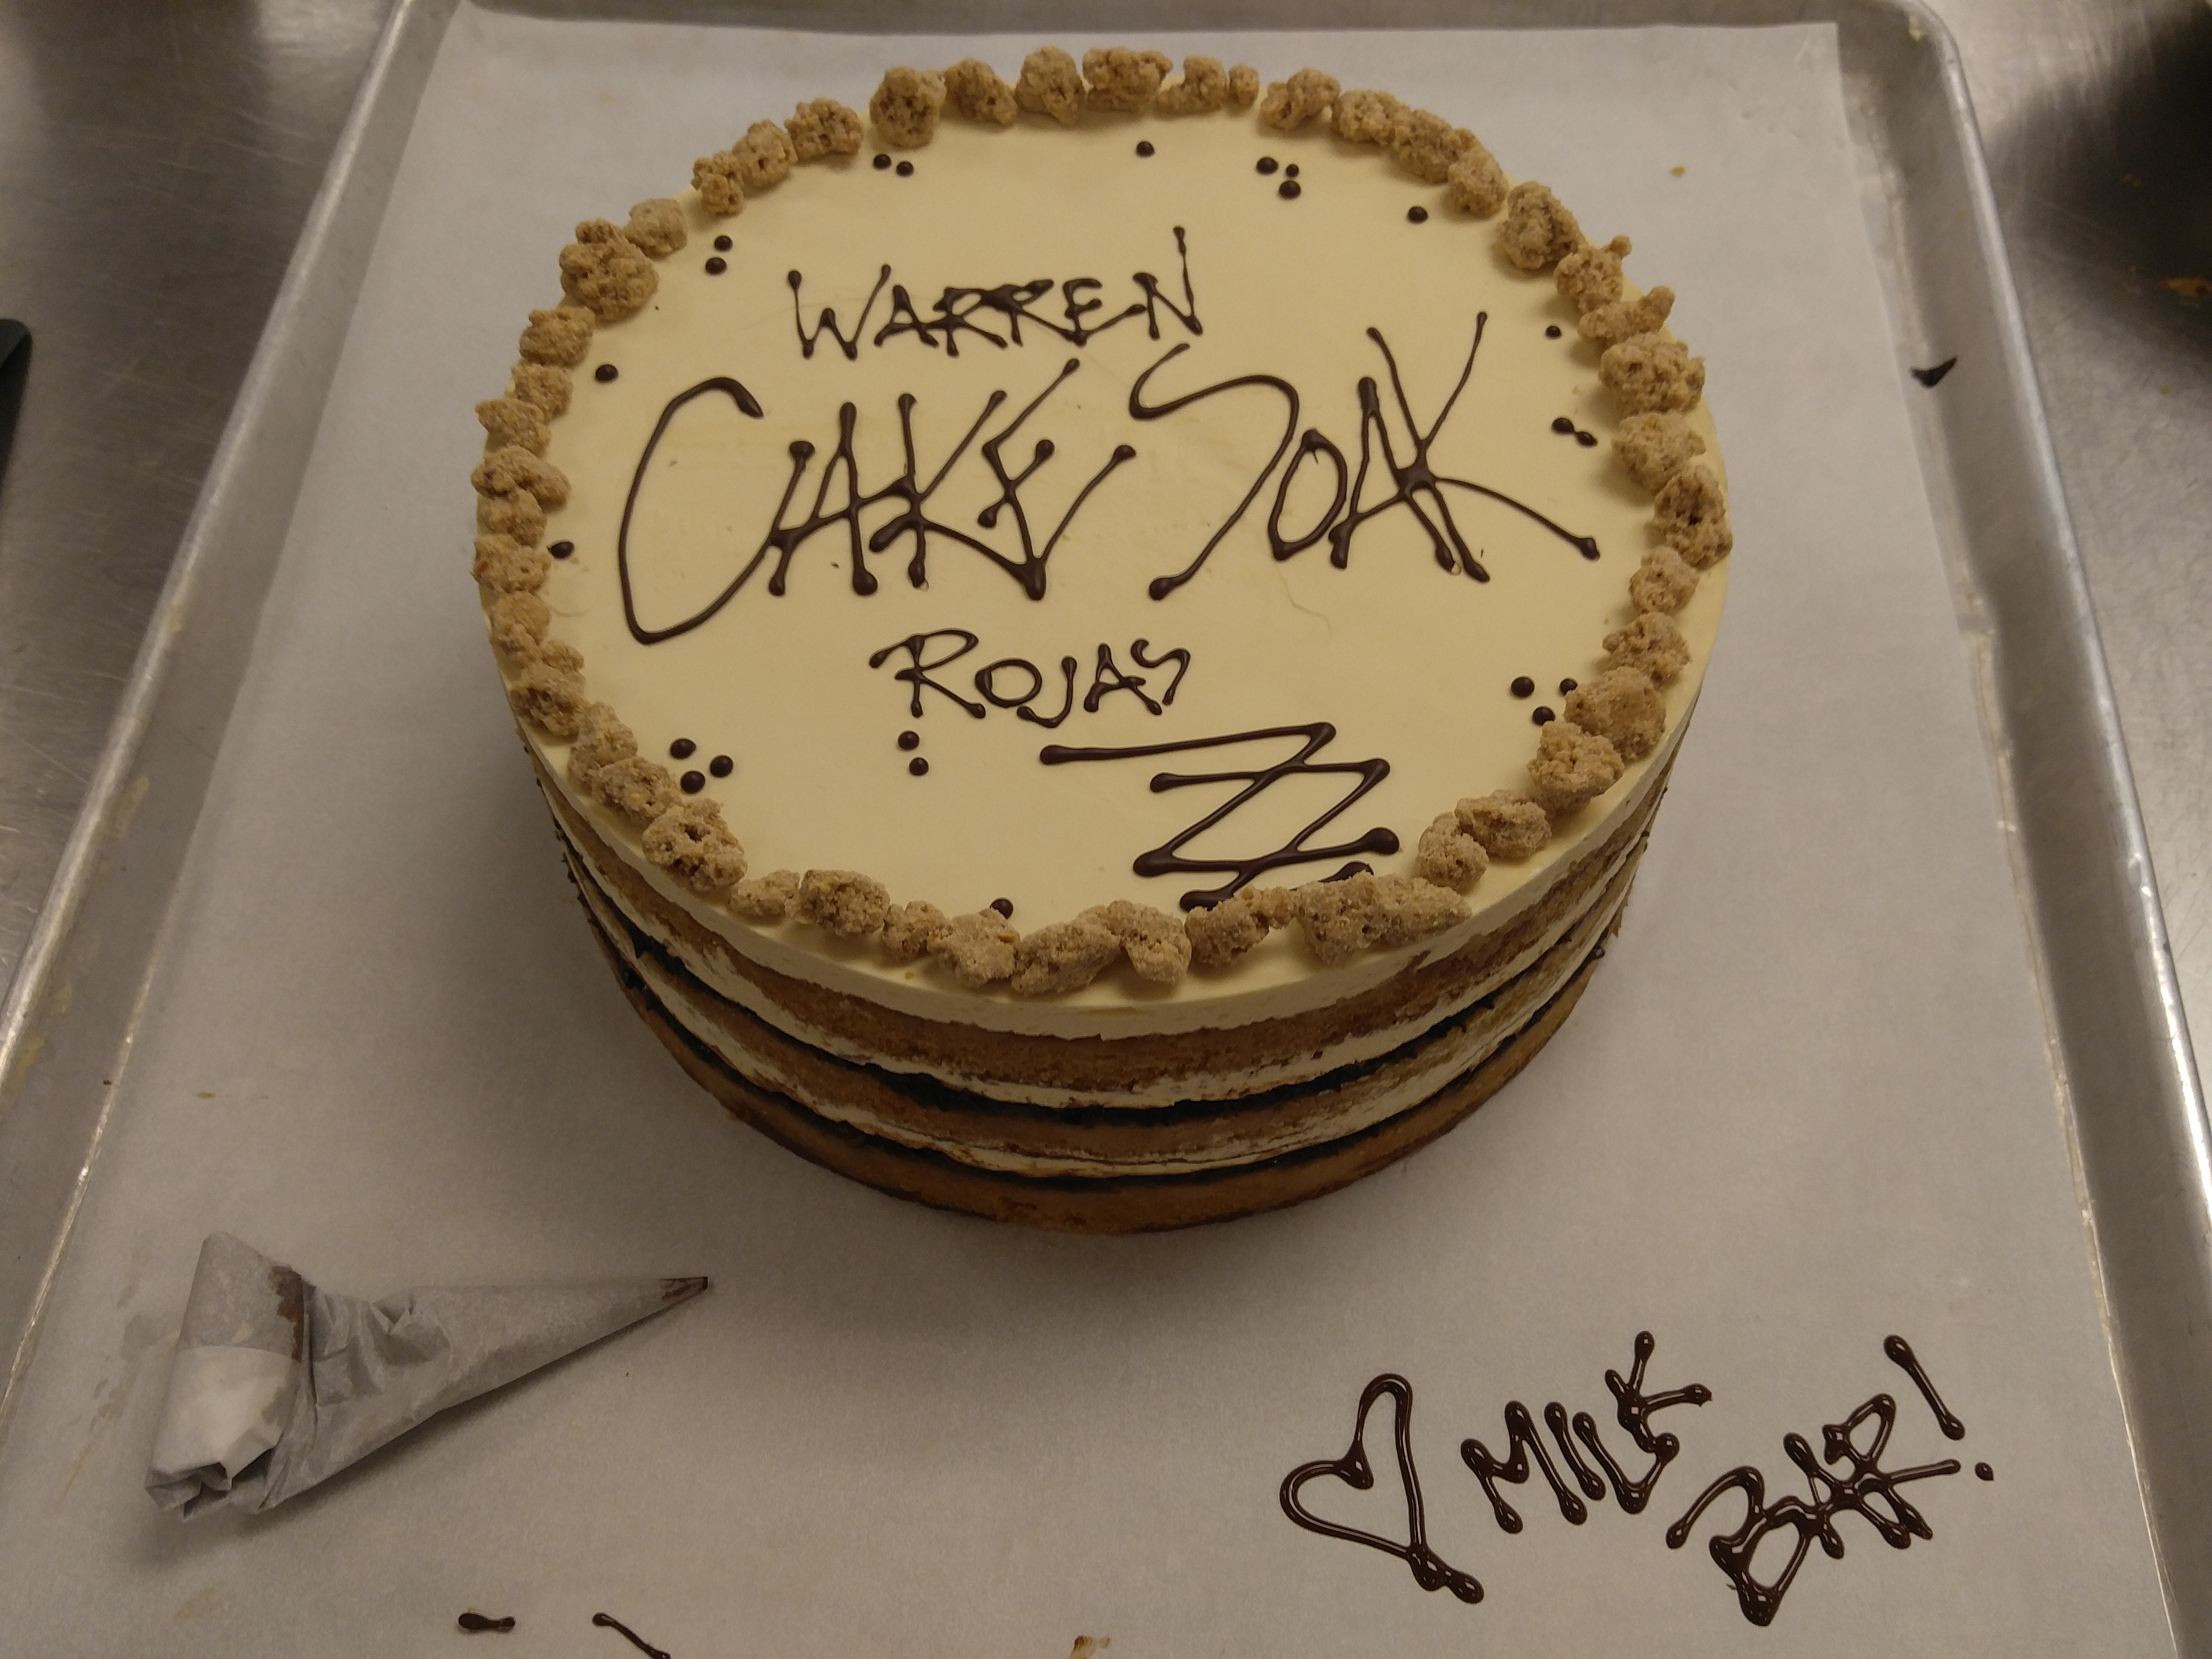 The custom salted pretzel cake Christina Tosi made for Eater at Milk Bar DC.